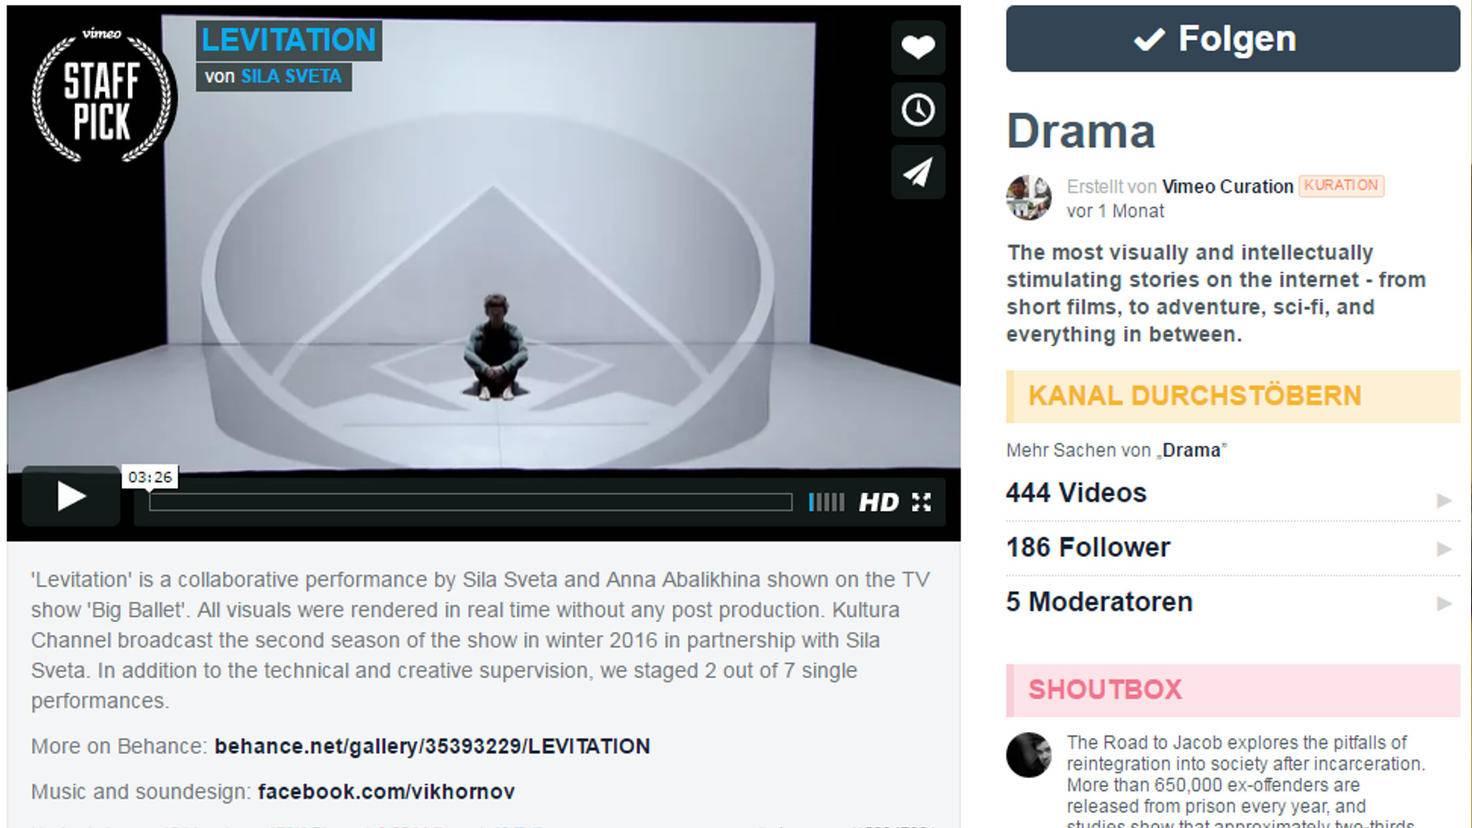 vimeo-screenshot